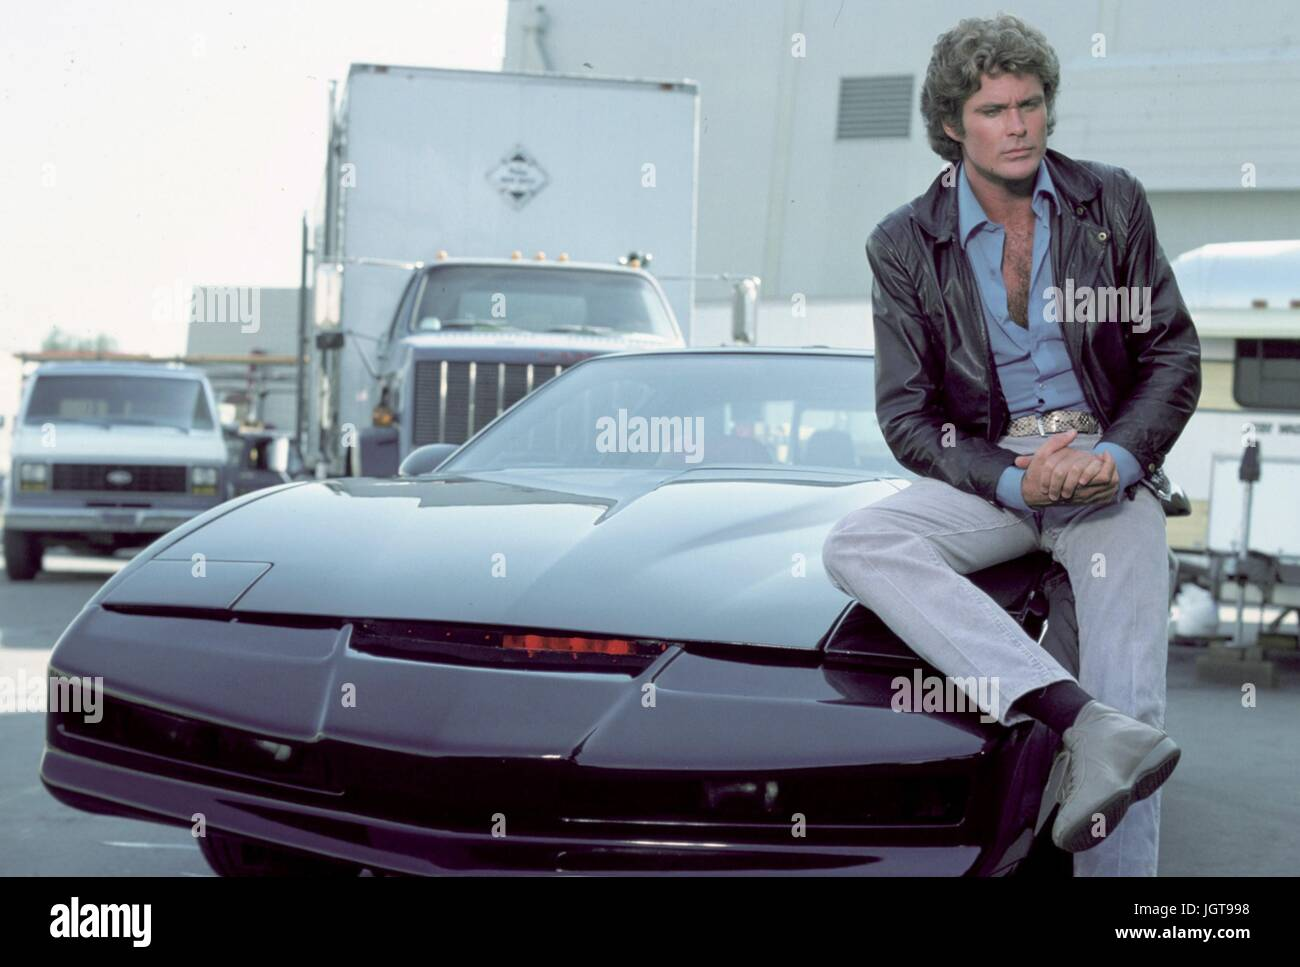 Knight Rider Car Stock Photos & Knight Rider Car Stock